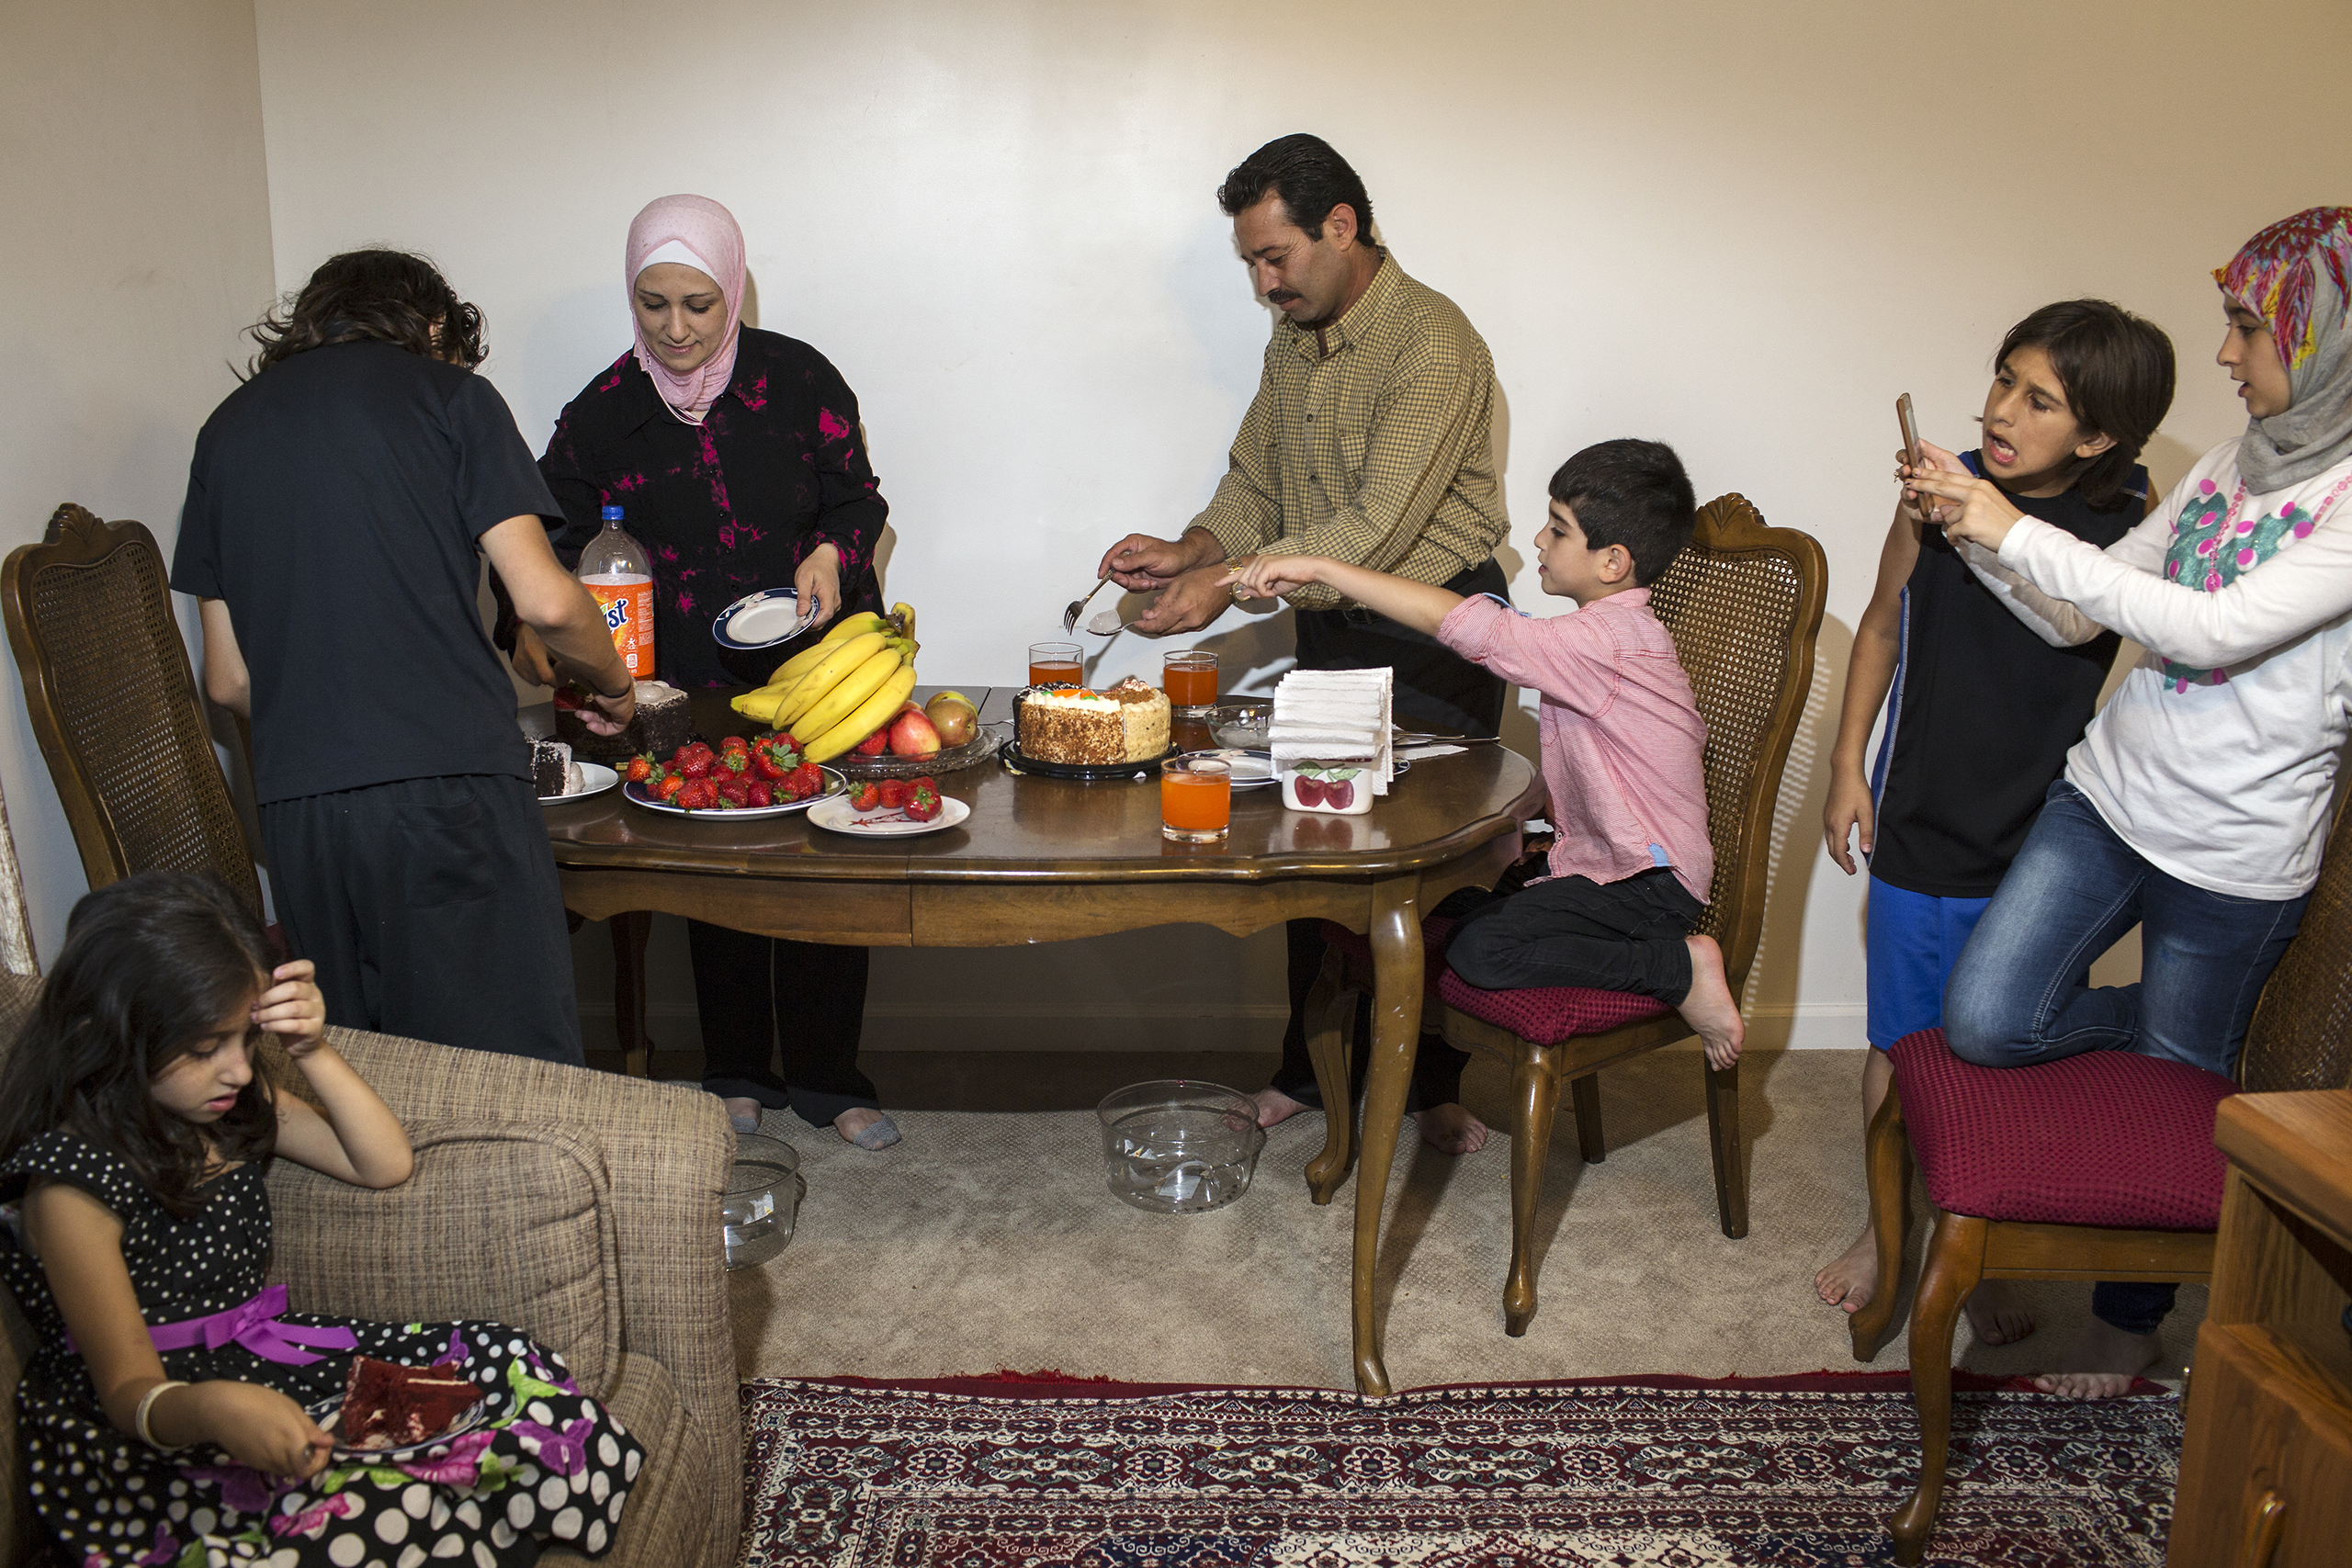 Ghazweh and her husband, Abdul Fattah, celebrate their 17th wedding anniversary with their children at their apartment in Des Moines, Iowa.